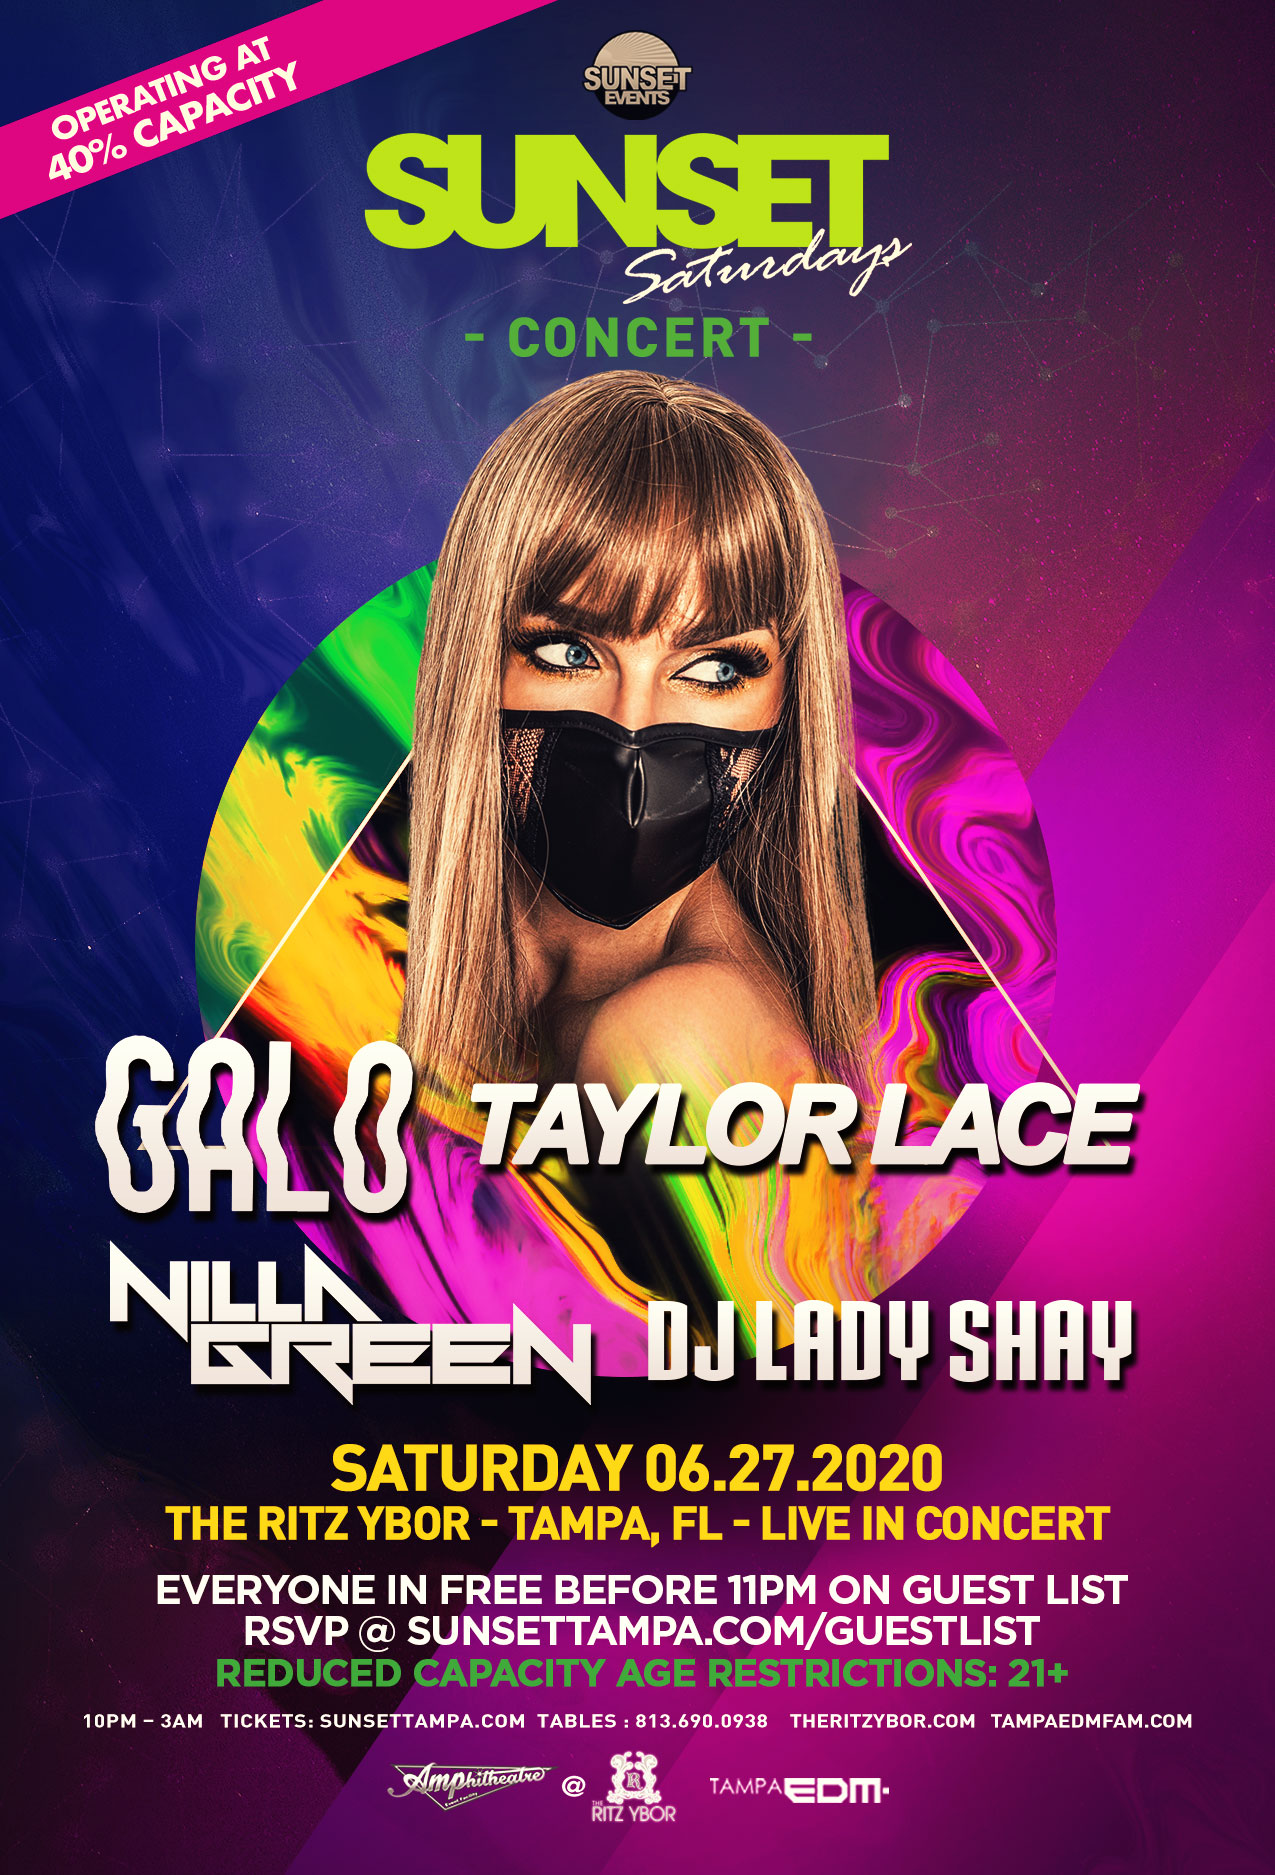 Sunset Saturdays in Concert at The RITZ Ybor – 6/27/2020